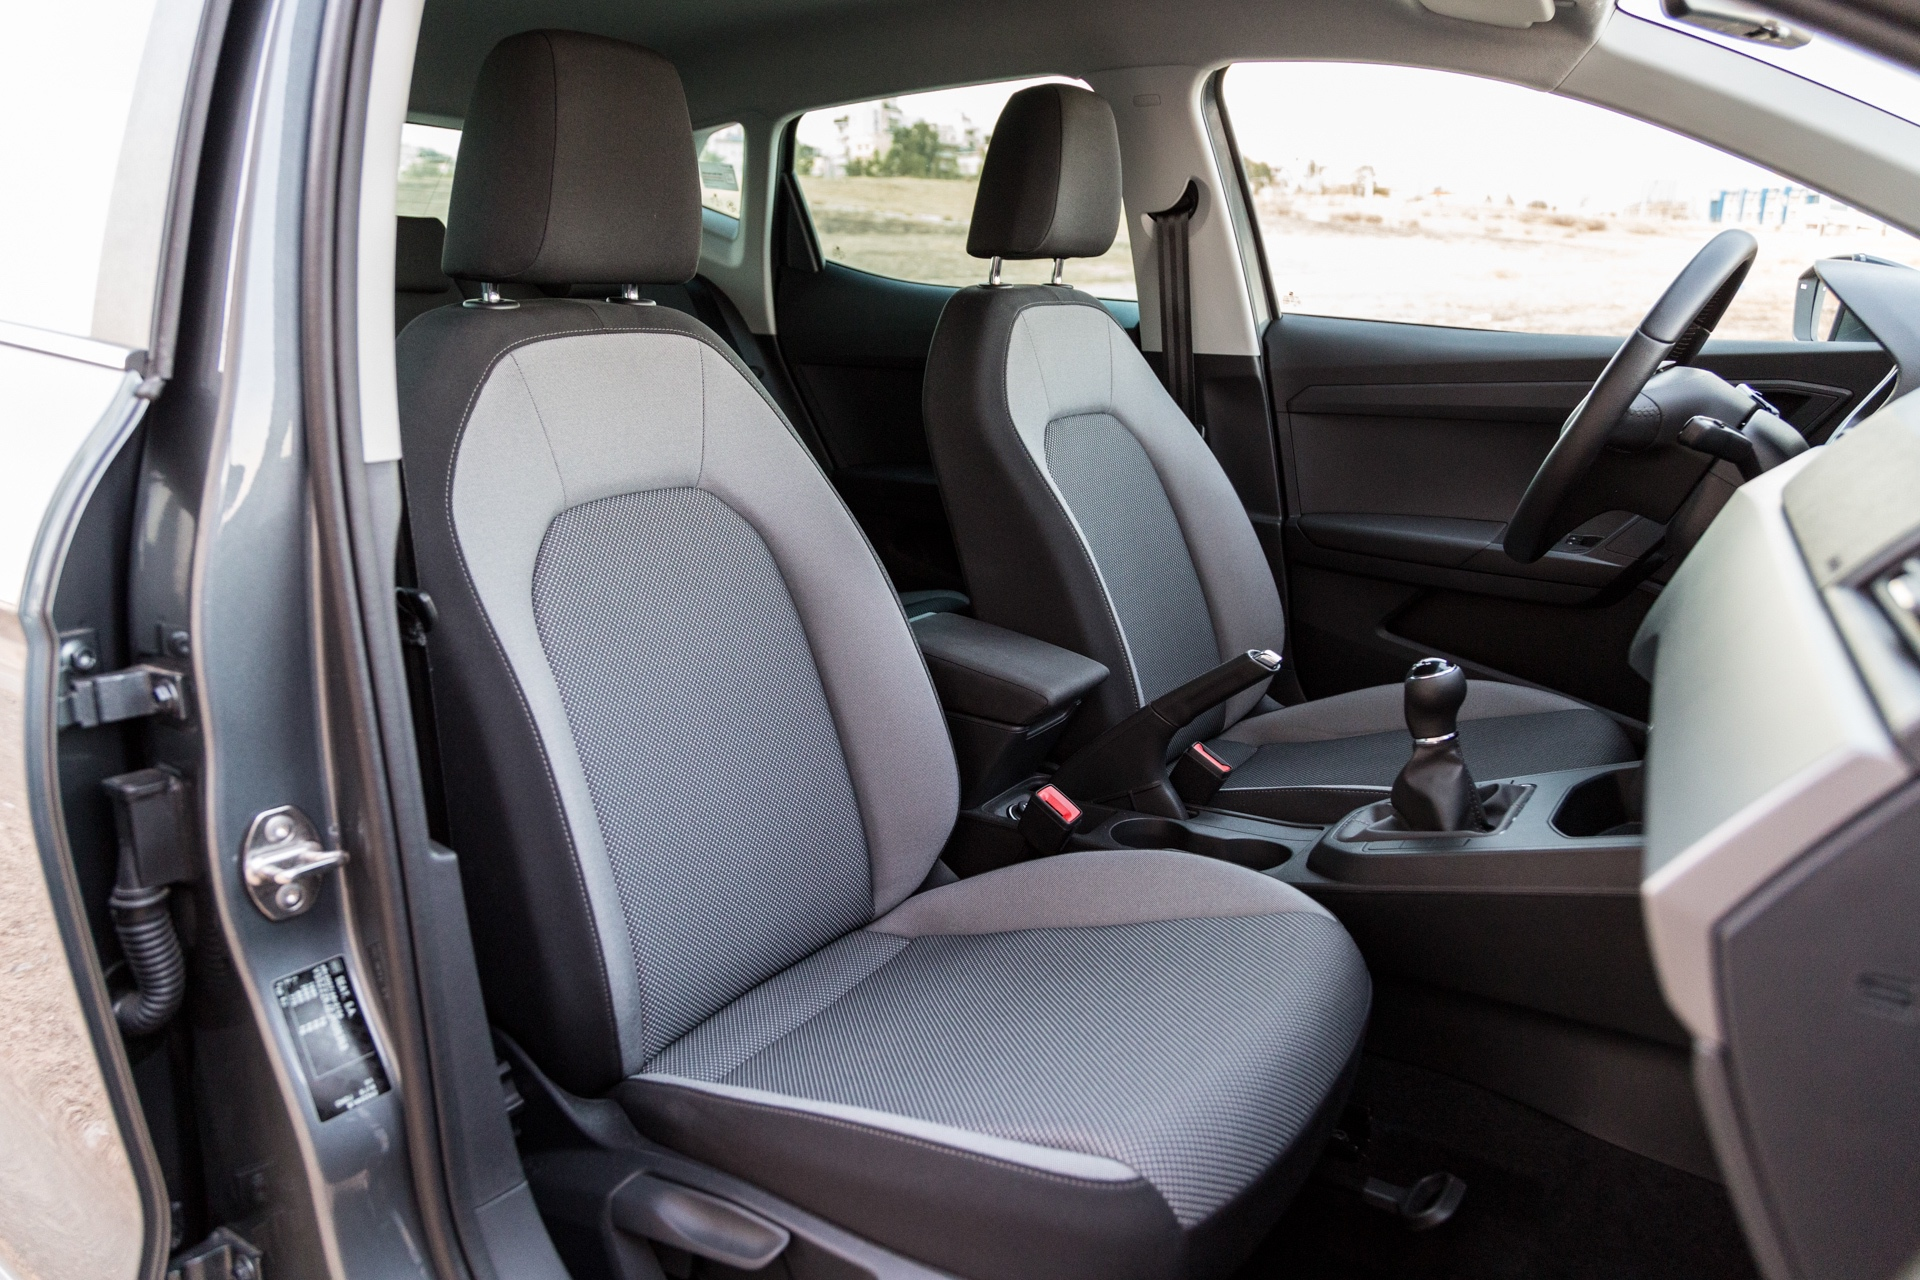 Test_Drive_Seat_Ibiza_1.0_36